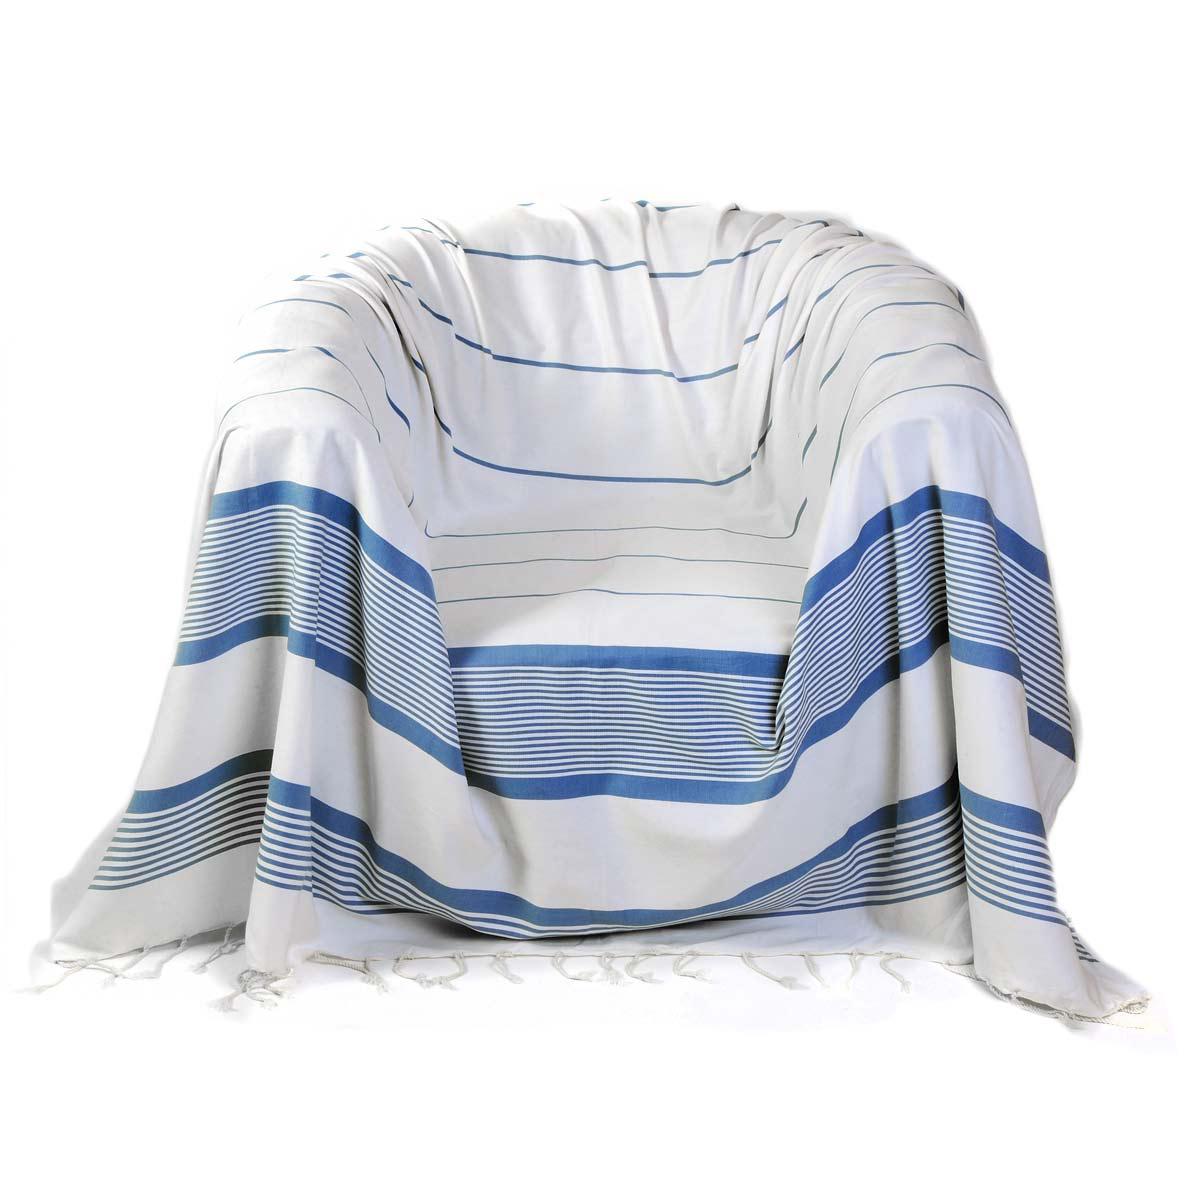 CARTHAGE - Jeté de fauteuil 100% coton blanc rayures bleu 200 x 200